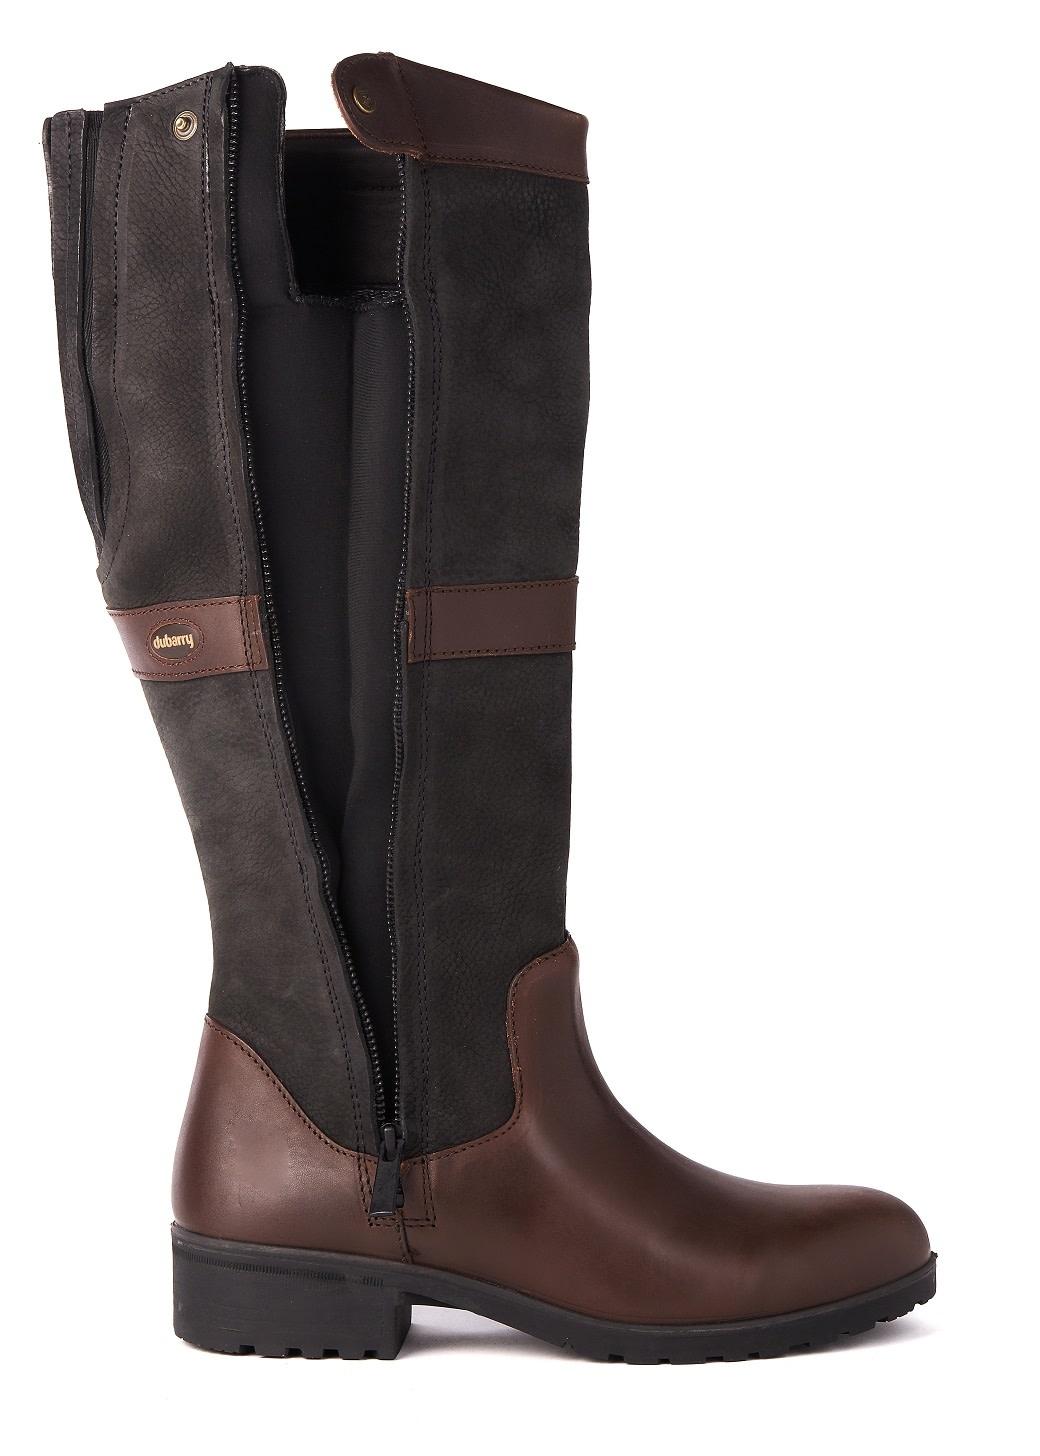 Dubarry Sligo - Black/Brown-5